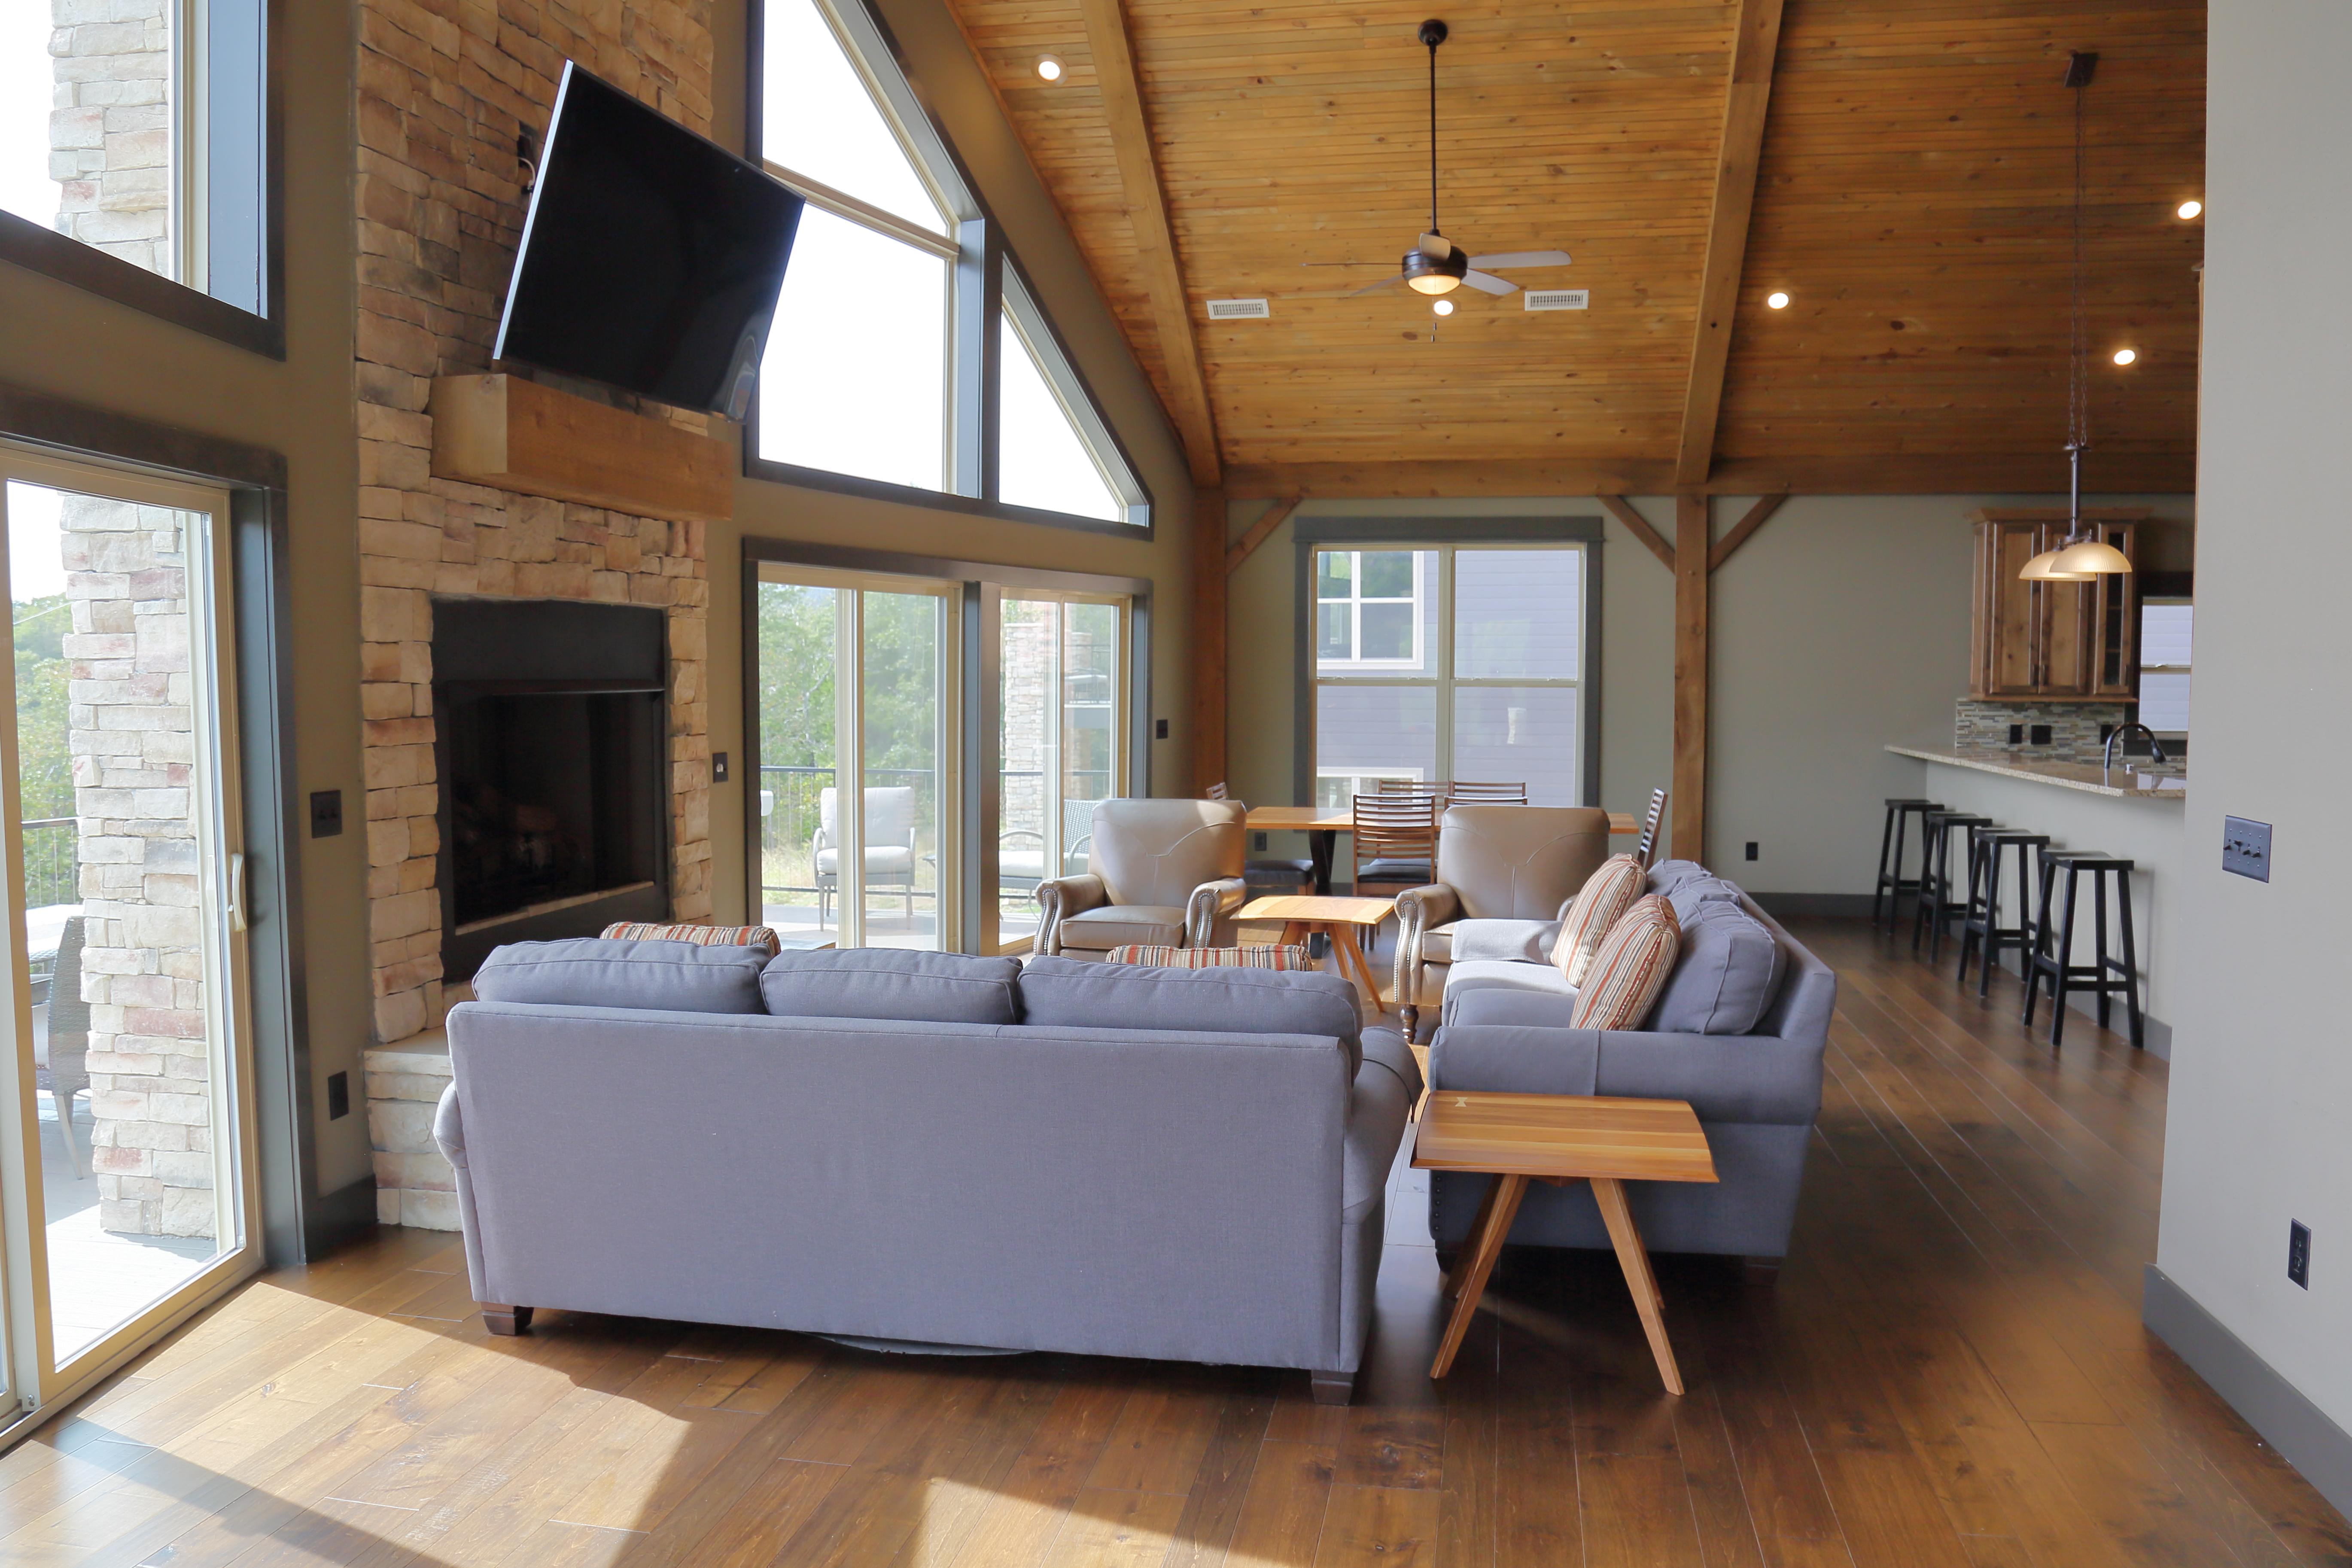 921A3920 - Living Room